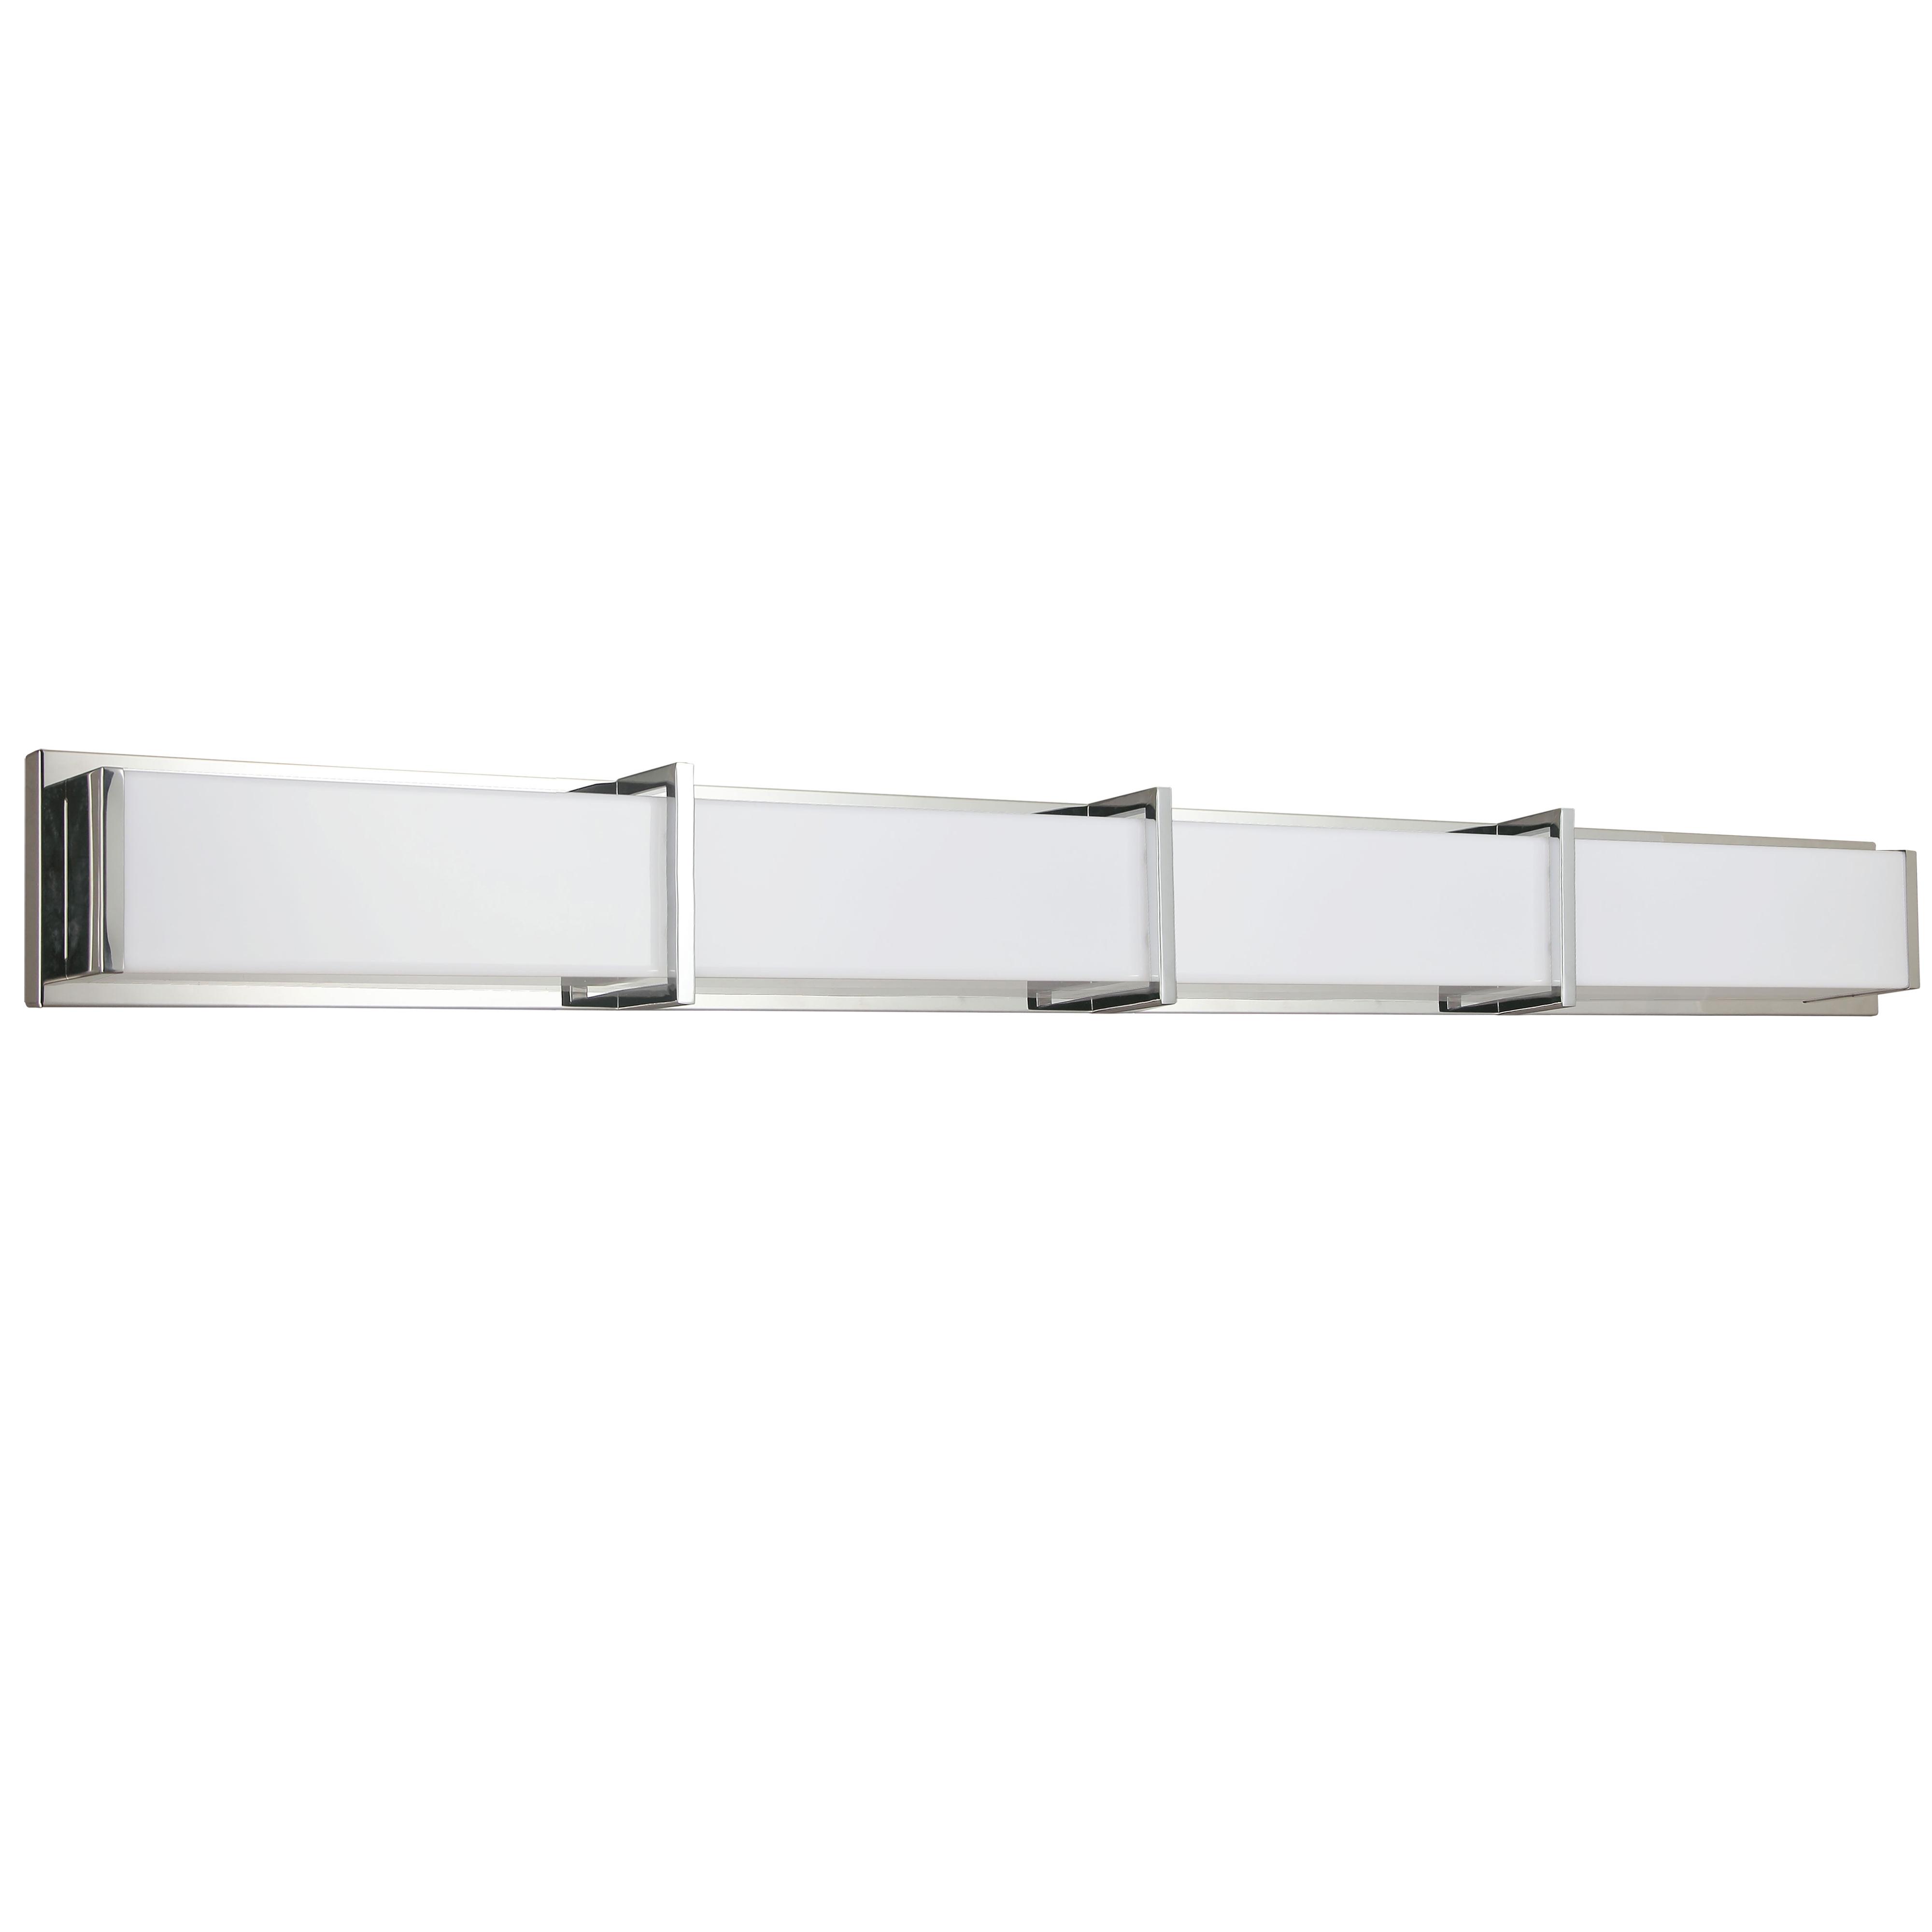 72W Polished Chrome Vanity Light w/ White Acrylic Diffuser